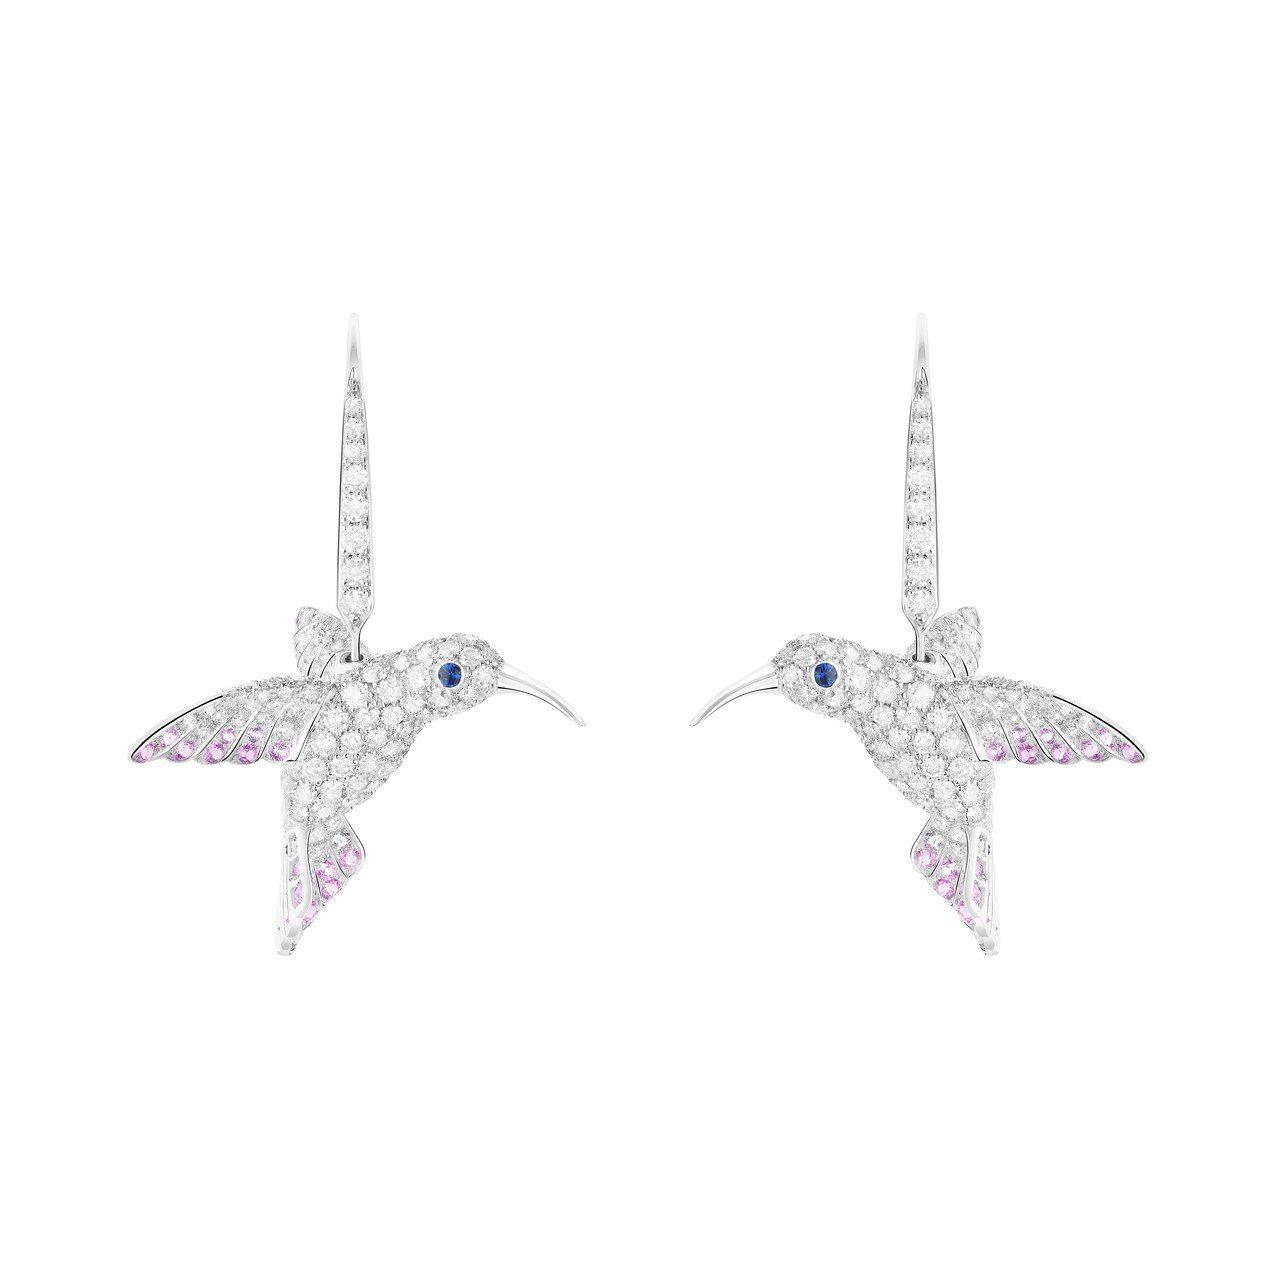 Boucheron,Animaux動物系列蜂鳥耳環,124萬元。圖╱Bouche...